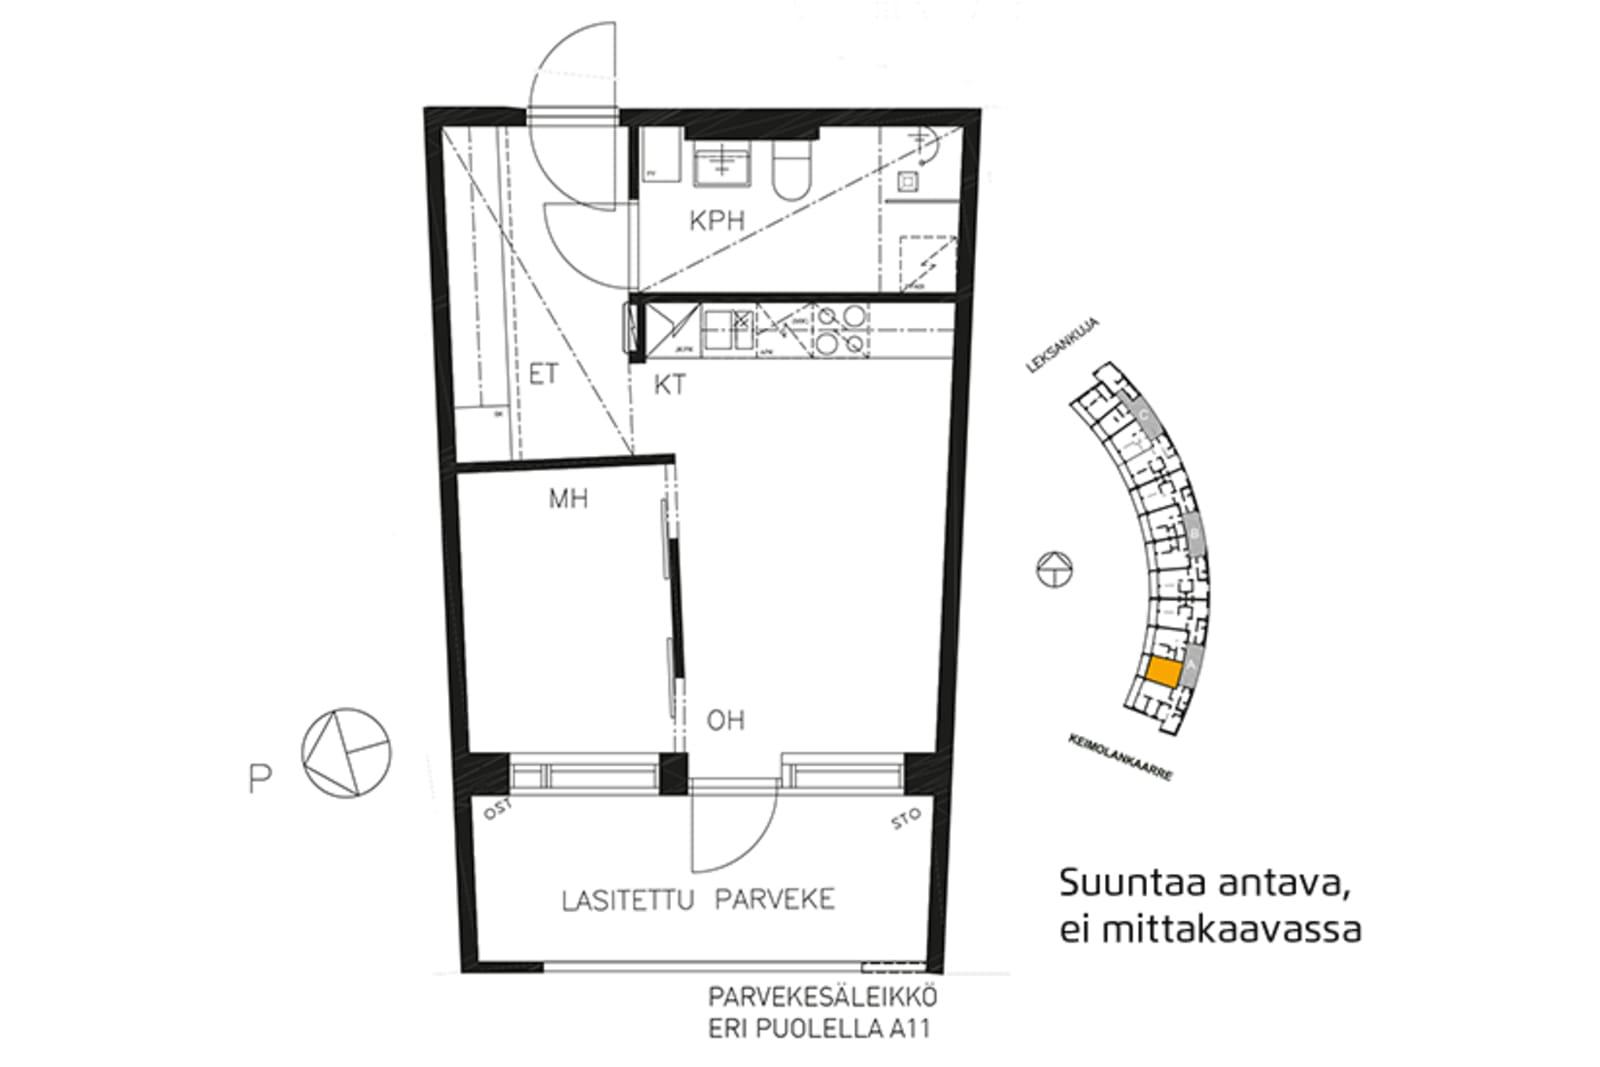 Vantaa, Keimolanmäki, Leksankuja 3 A 003